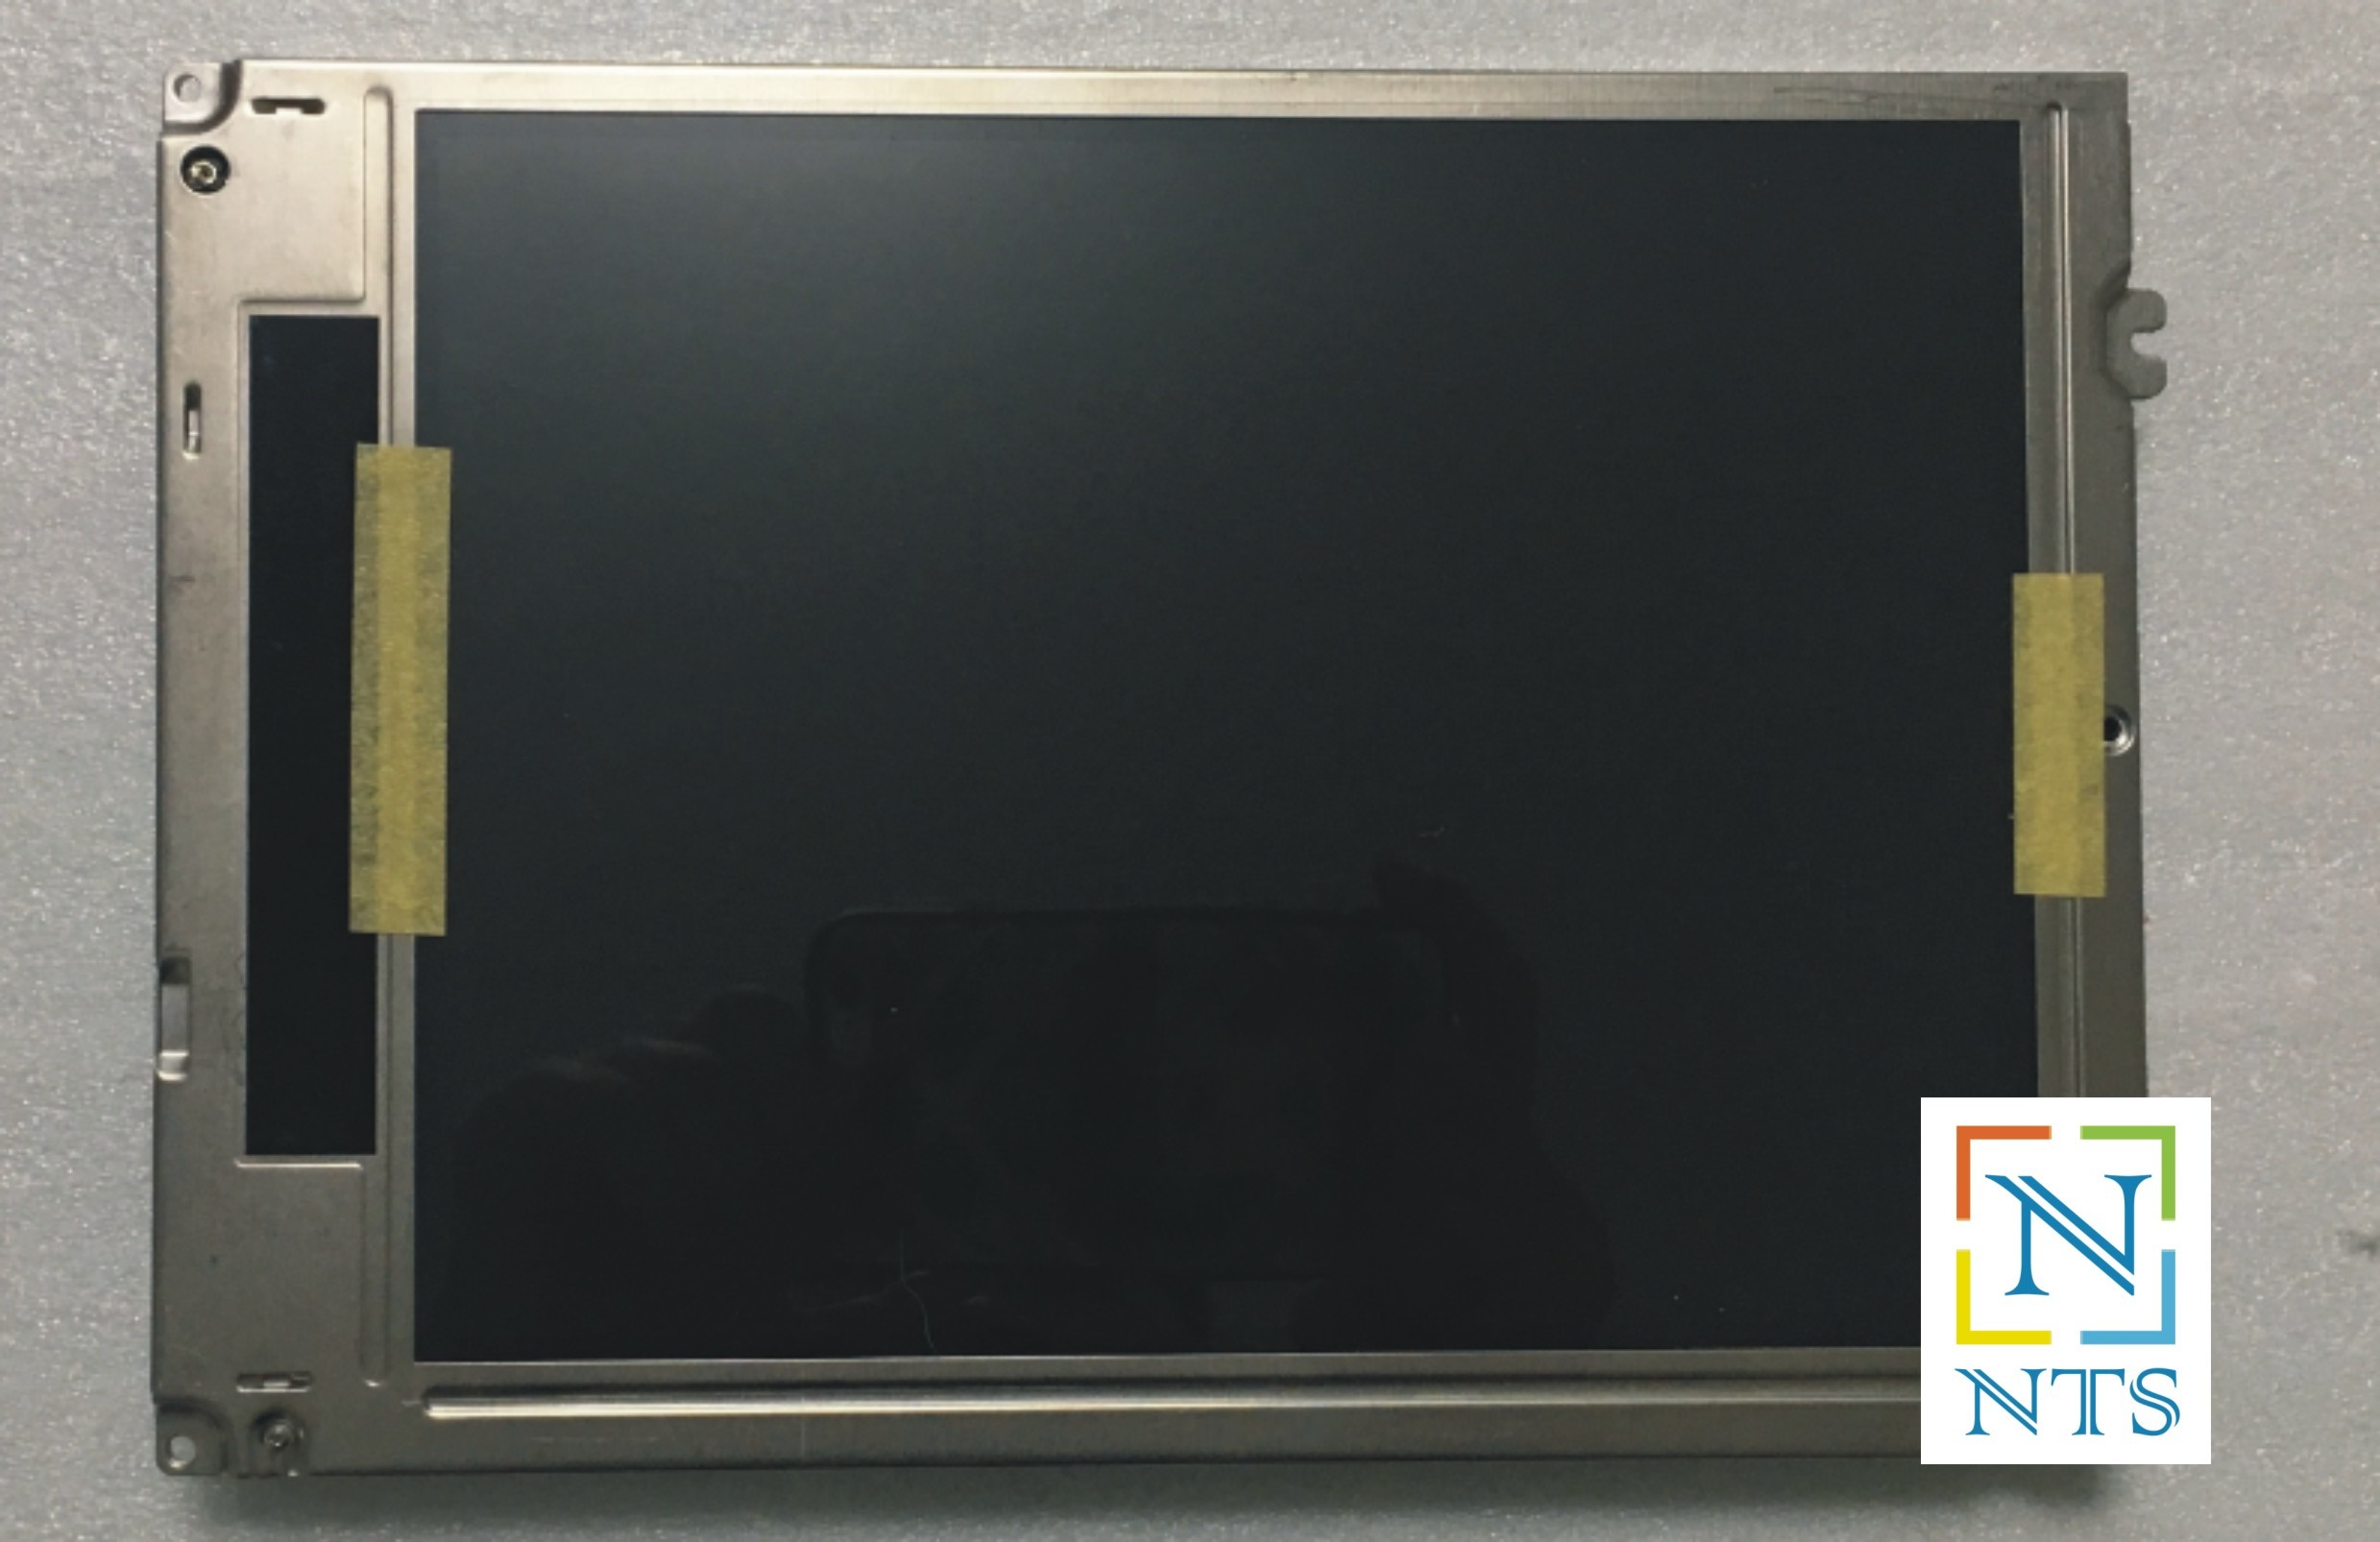 Mitsubishi AA084VD02 LCD Display